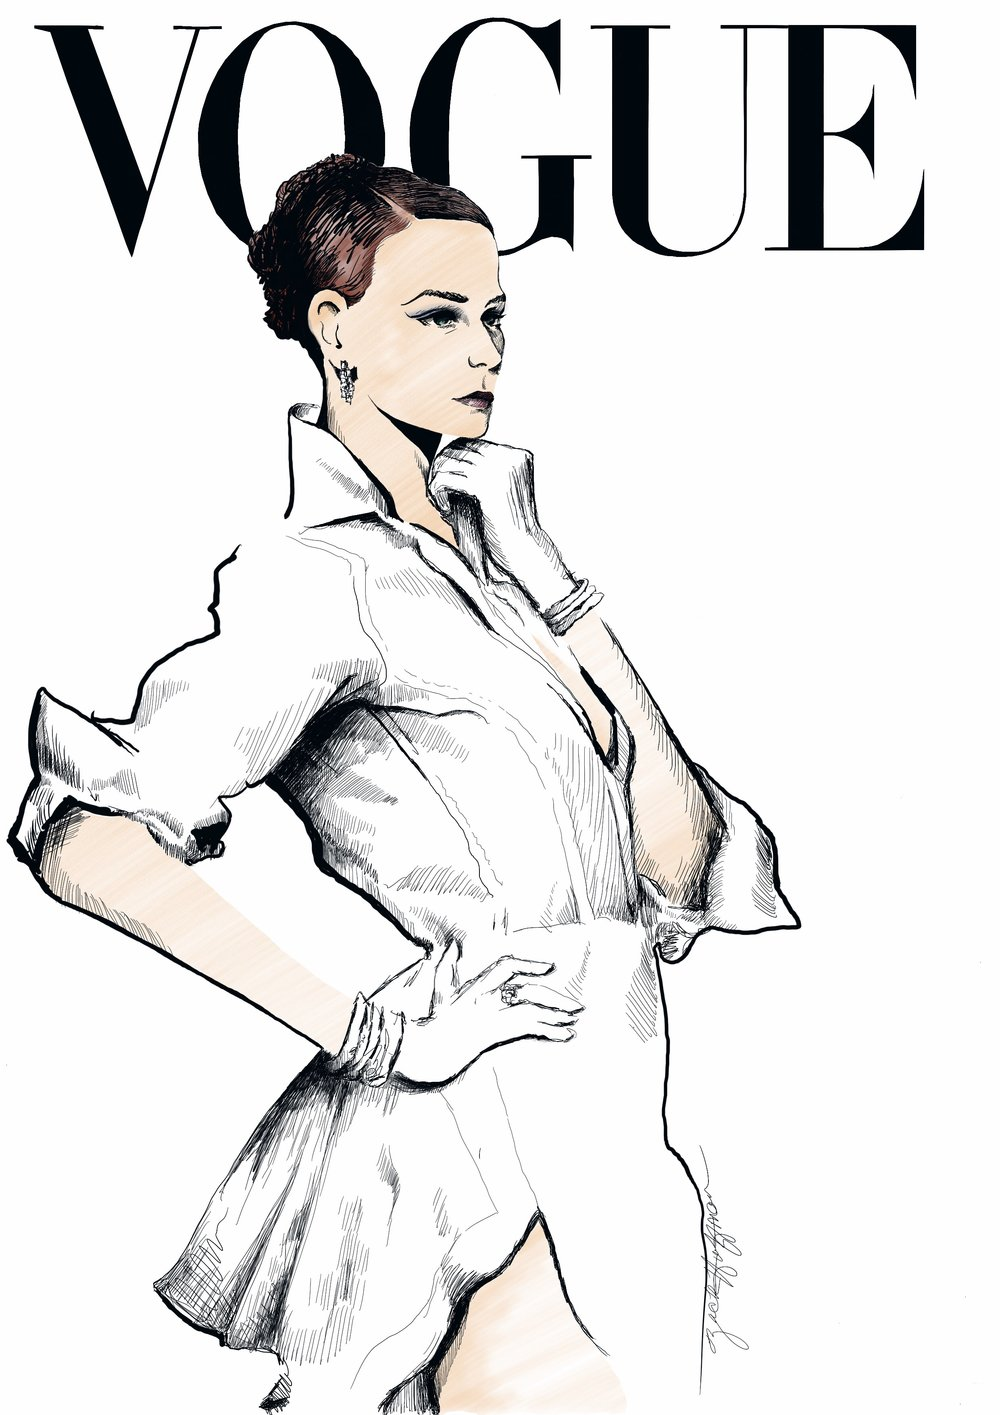 Vogue Girl 1 JPEG.jpg